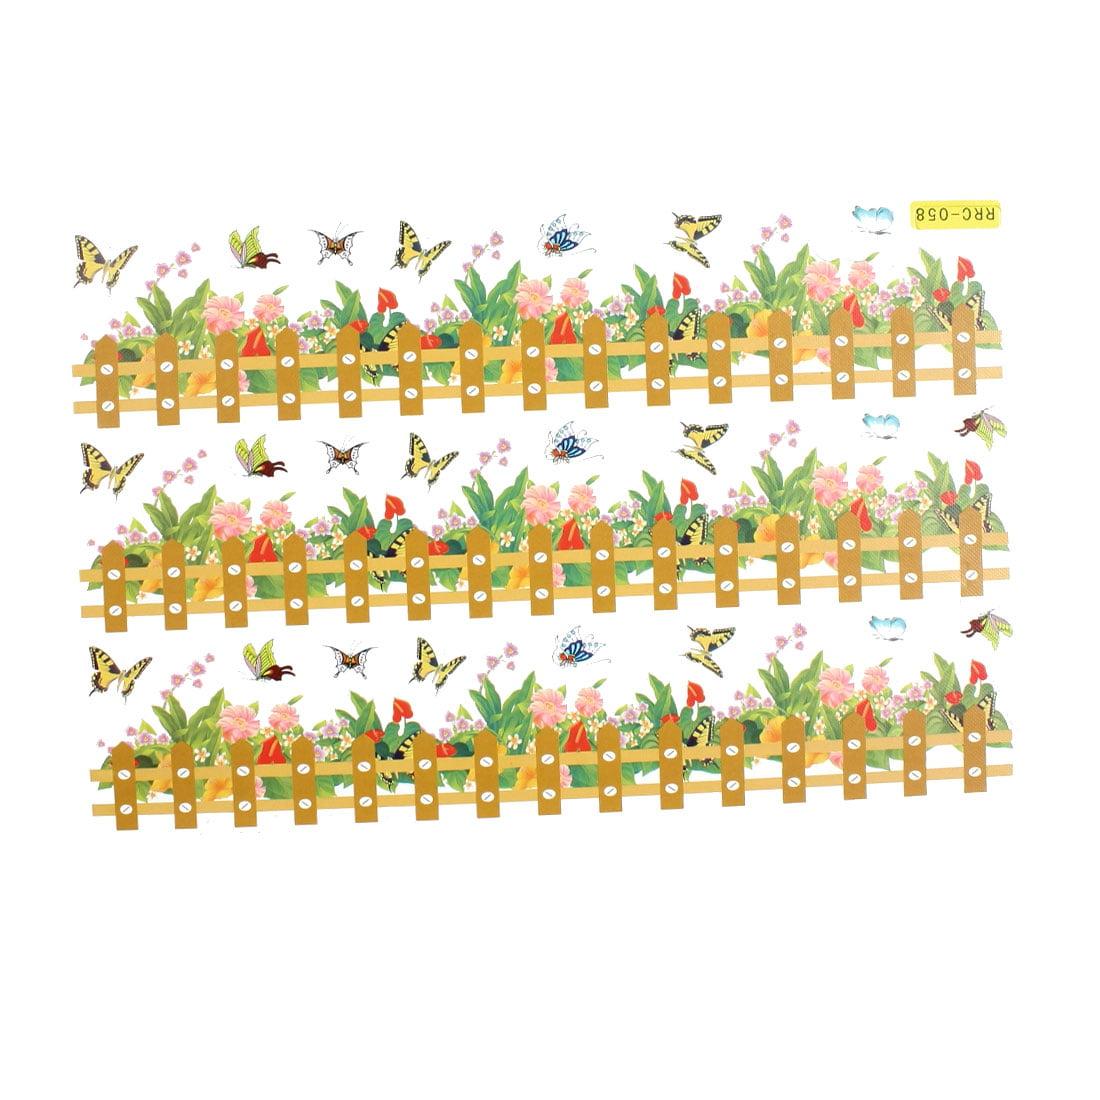 Flower Butterfly Rail Fence Pattern Decor Paper Foam Made Wall Sticker Decal